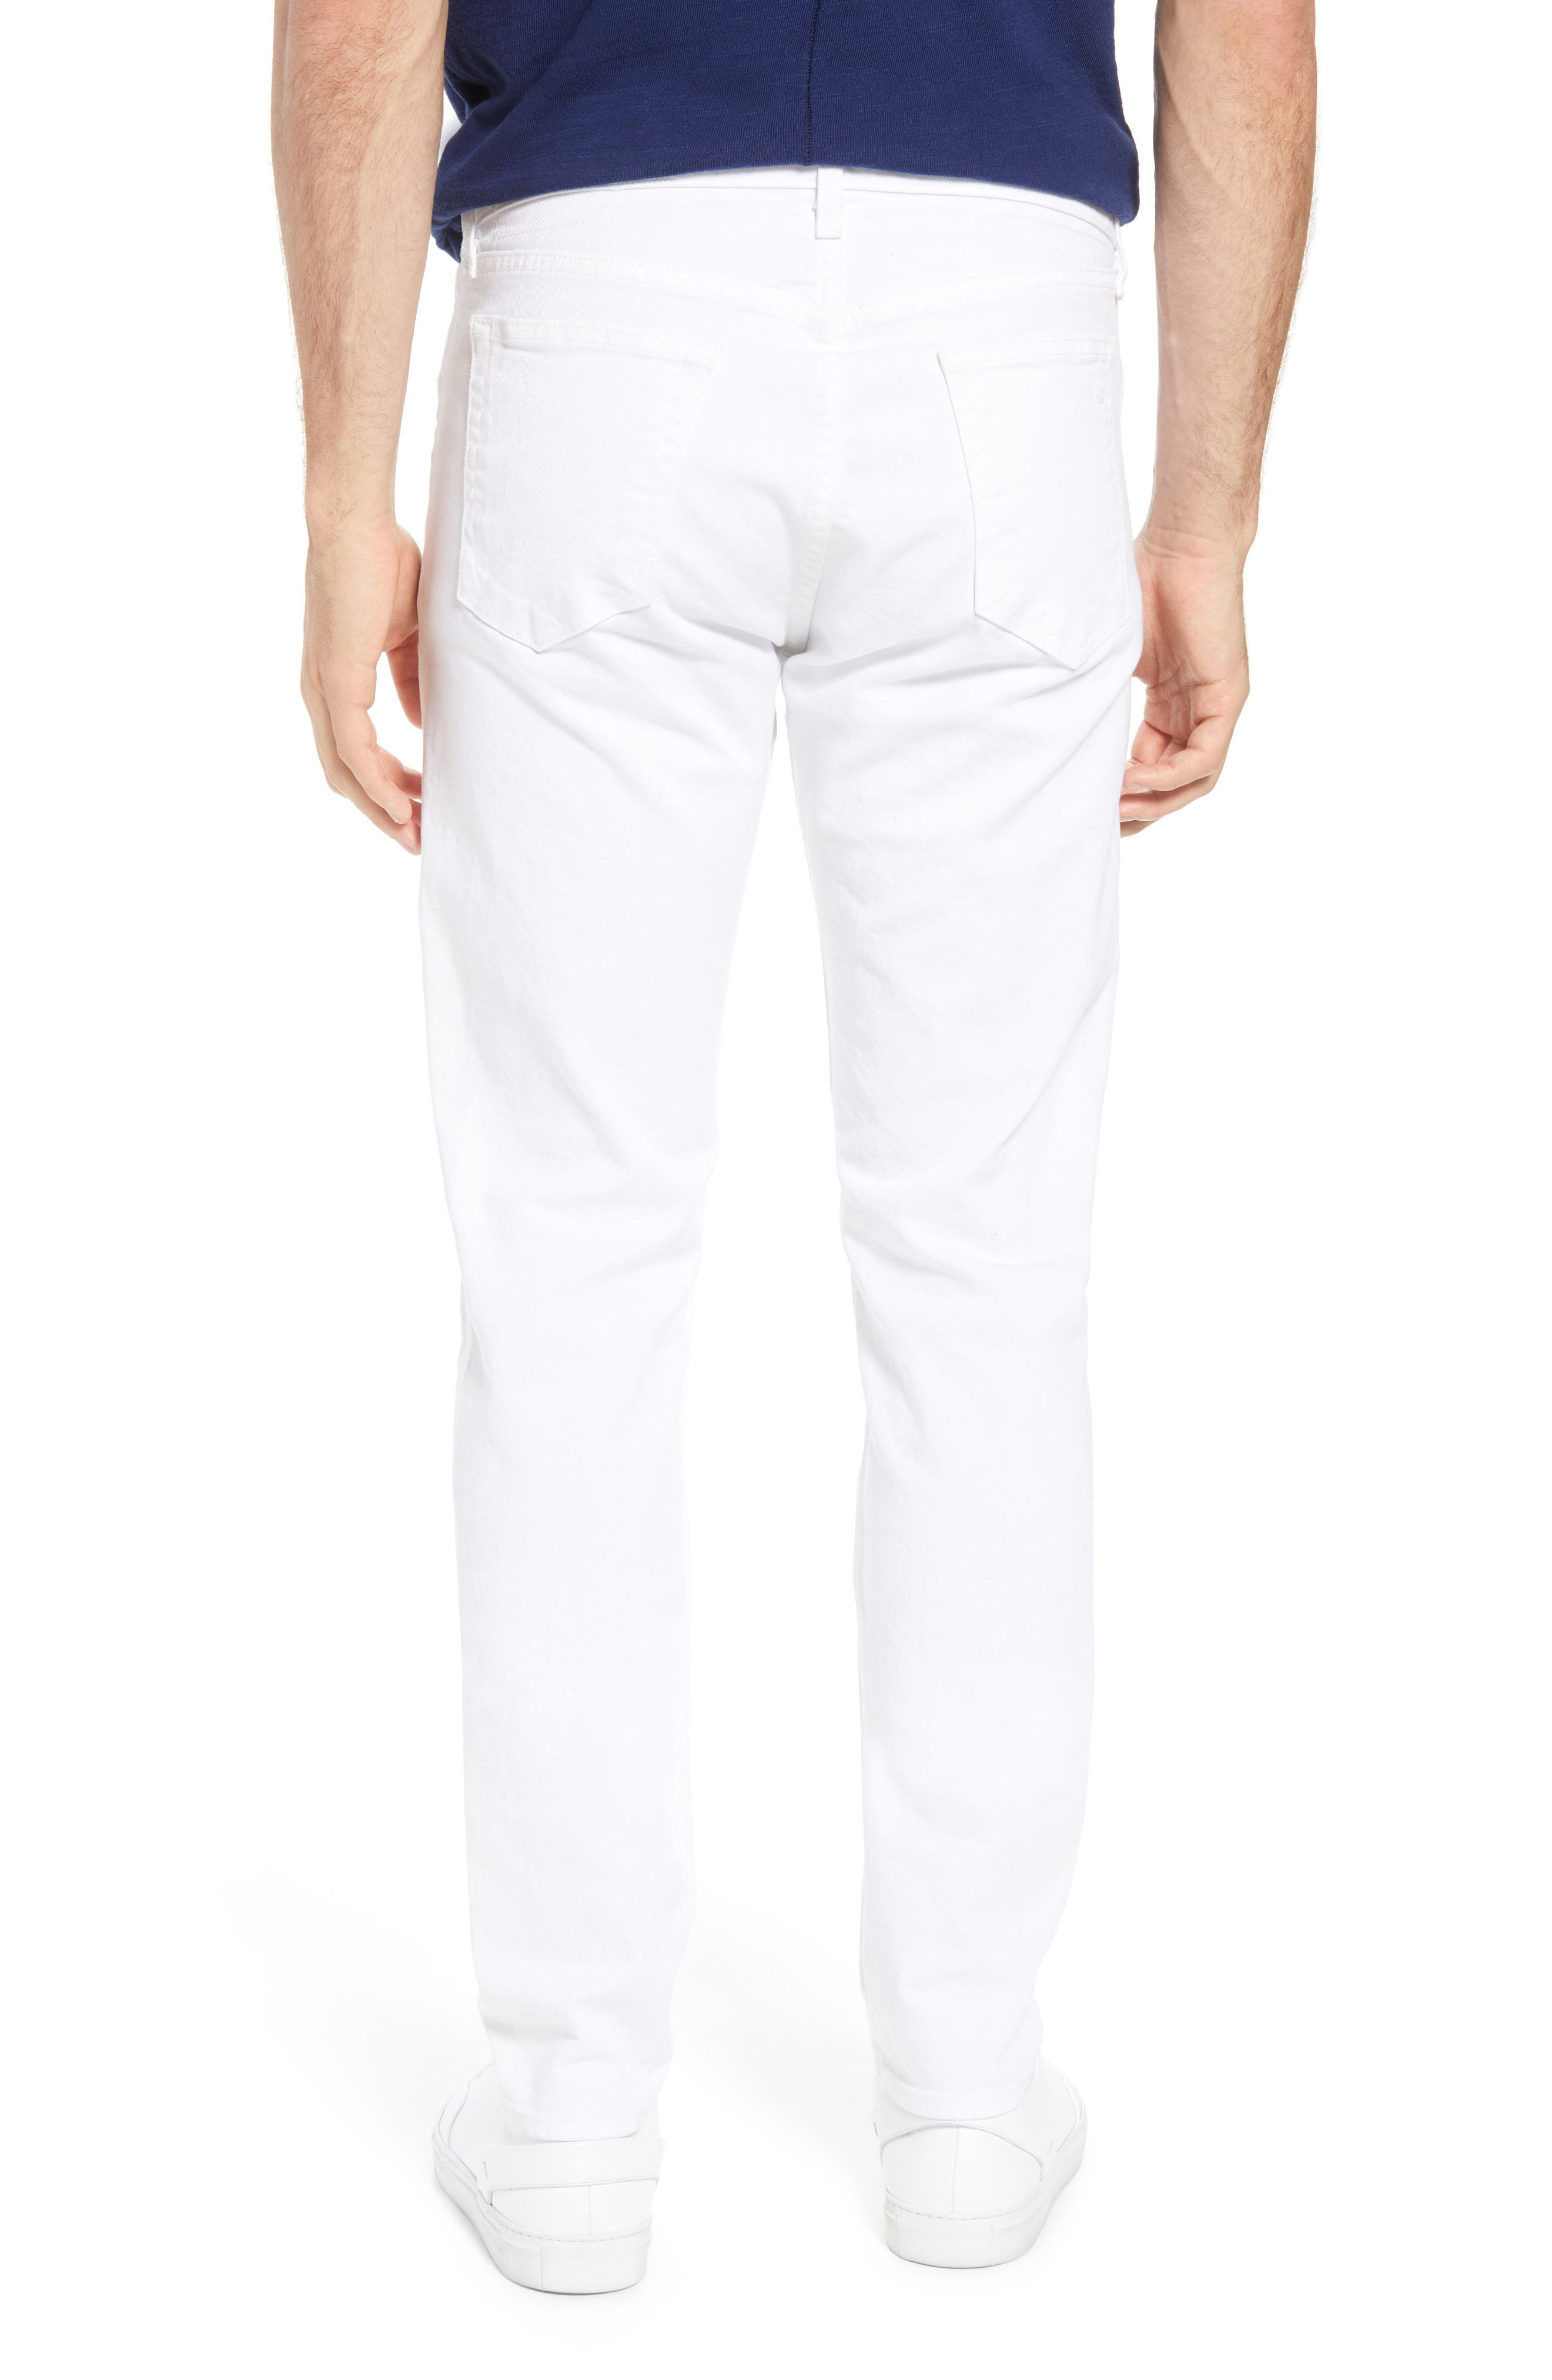 Fit 2 Slim Fit Jeans,                             Alternate thumbnail 2, color,                             White